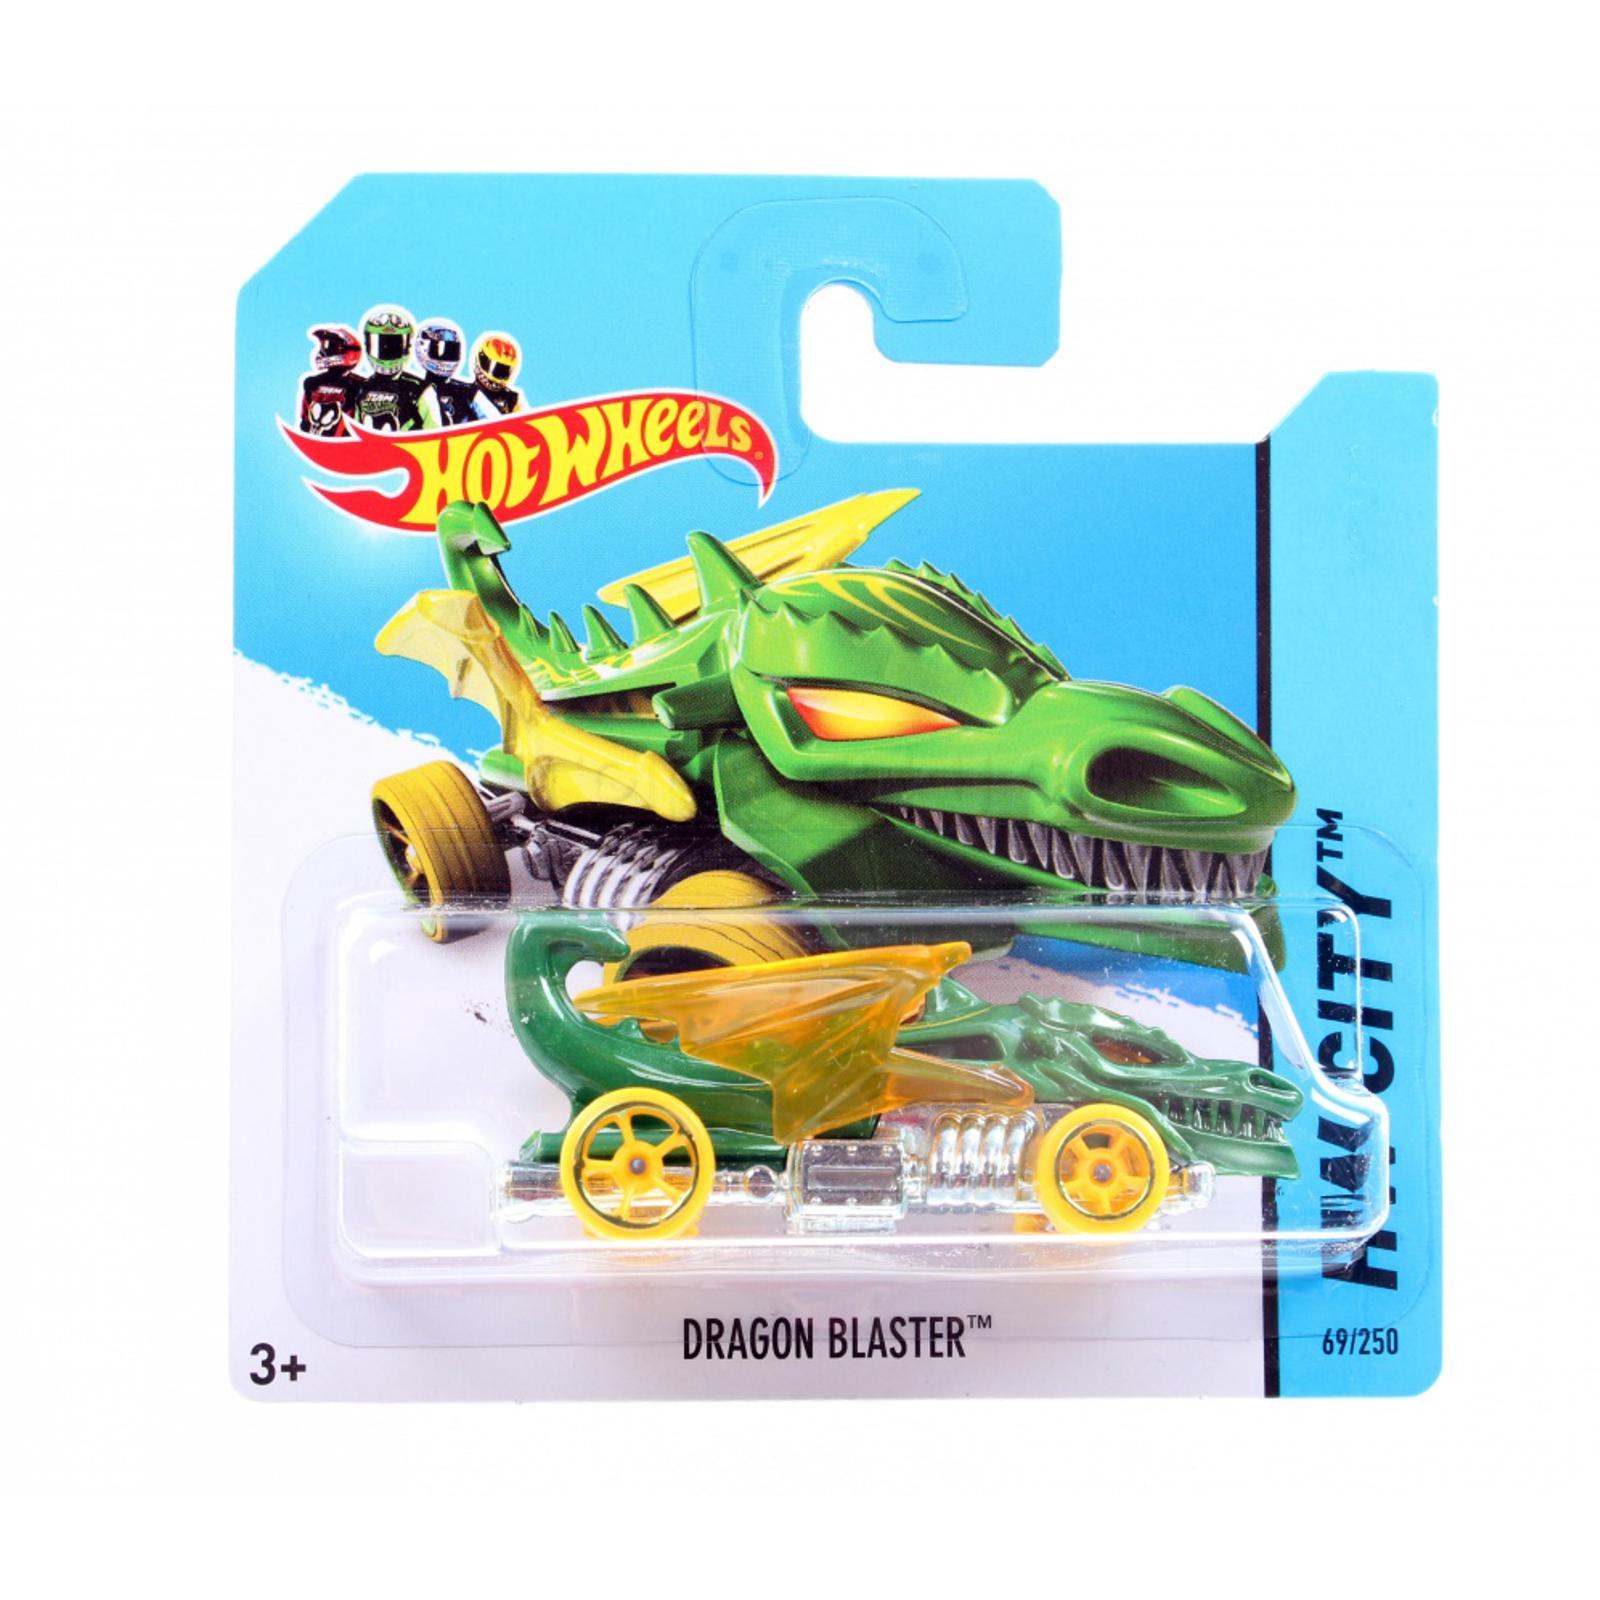 ����������� Hot Wheels ��� ������ Dragon Blaster